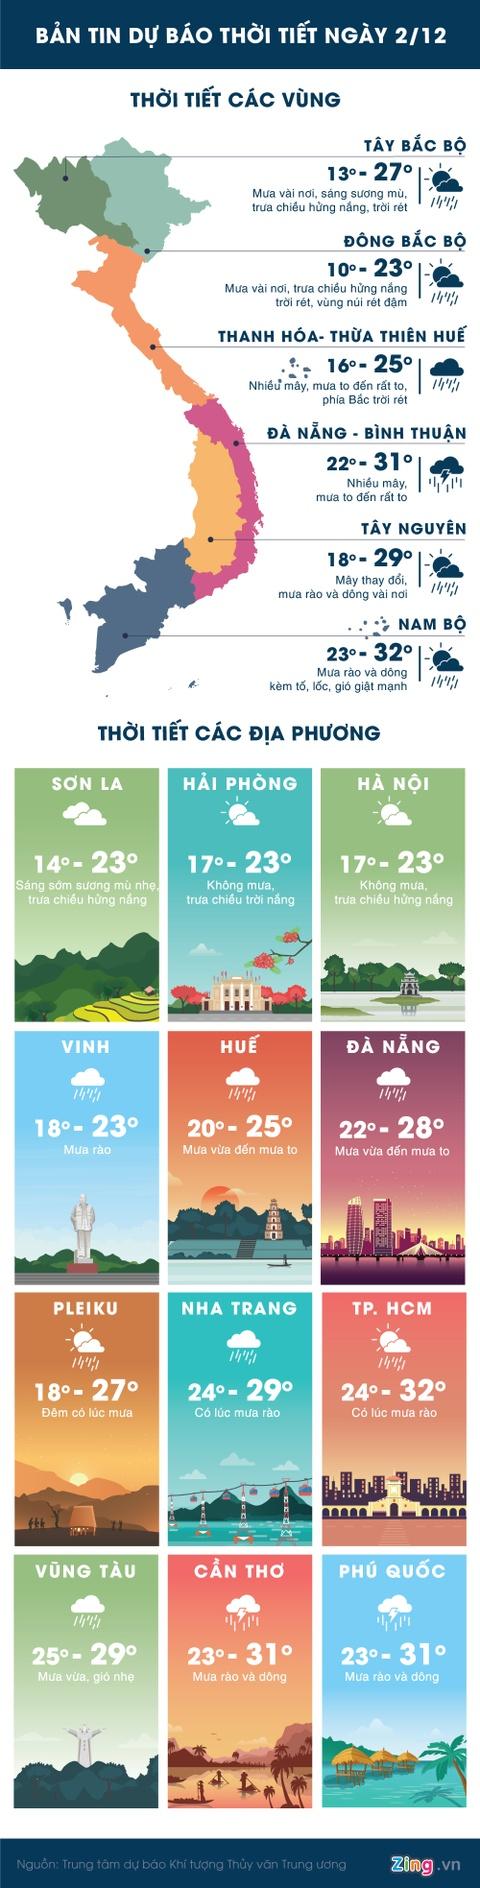 Thoi tiet 2/12: Canh bao trieu cuong Nam Bo, Sai Gon co the ngap sau hinh anh 1